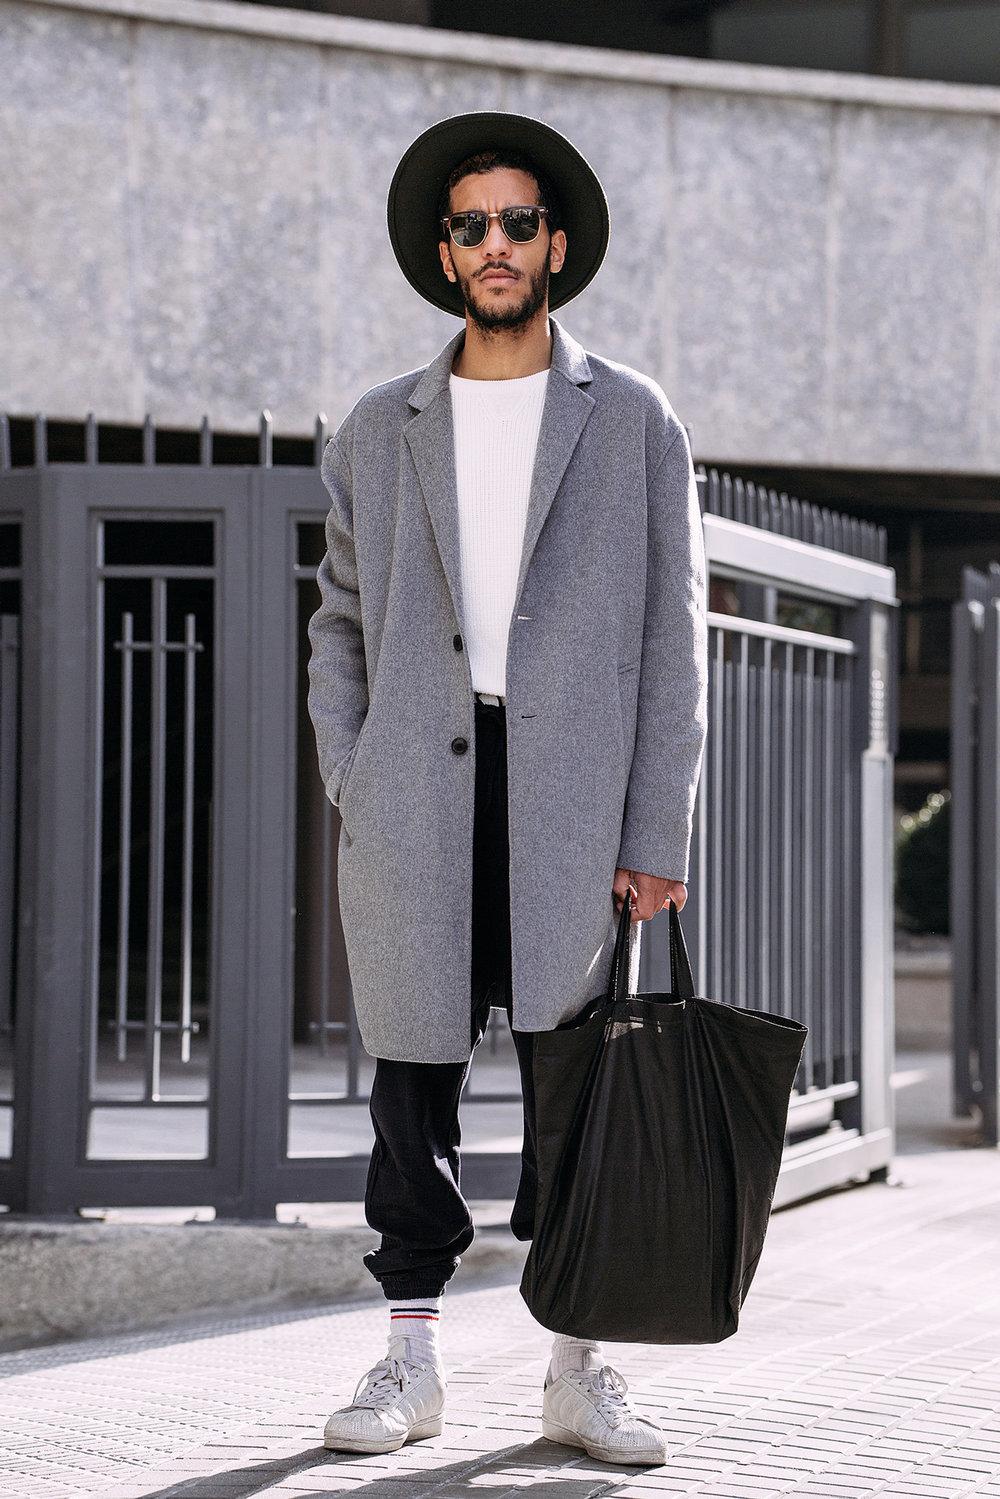 street-style-barcelona-profesional-leandro-crespi-fotografo.jpg